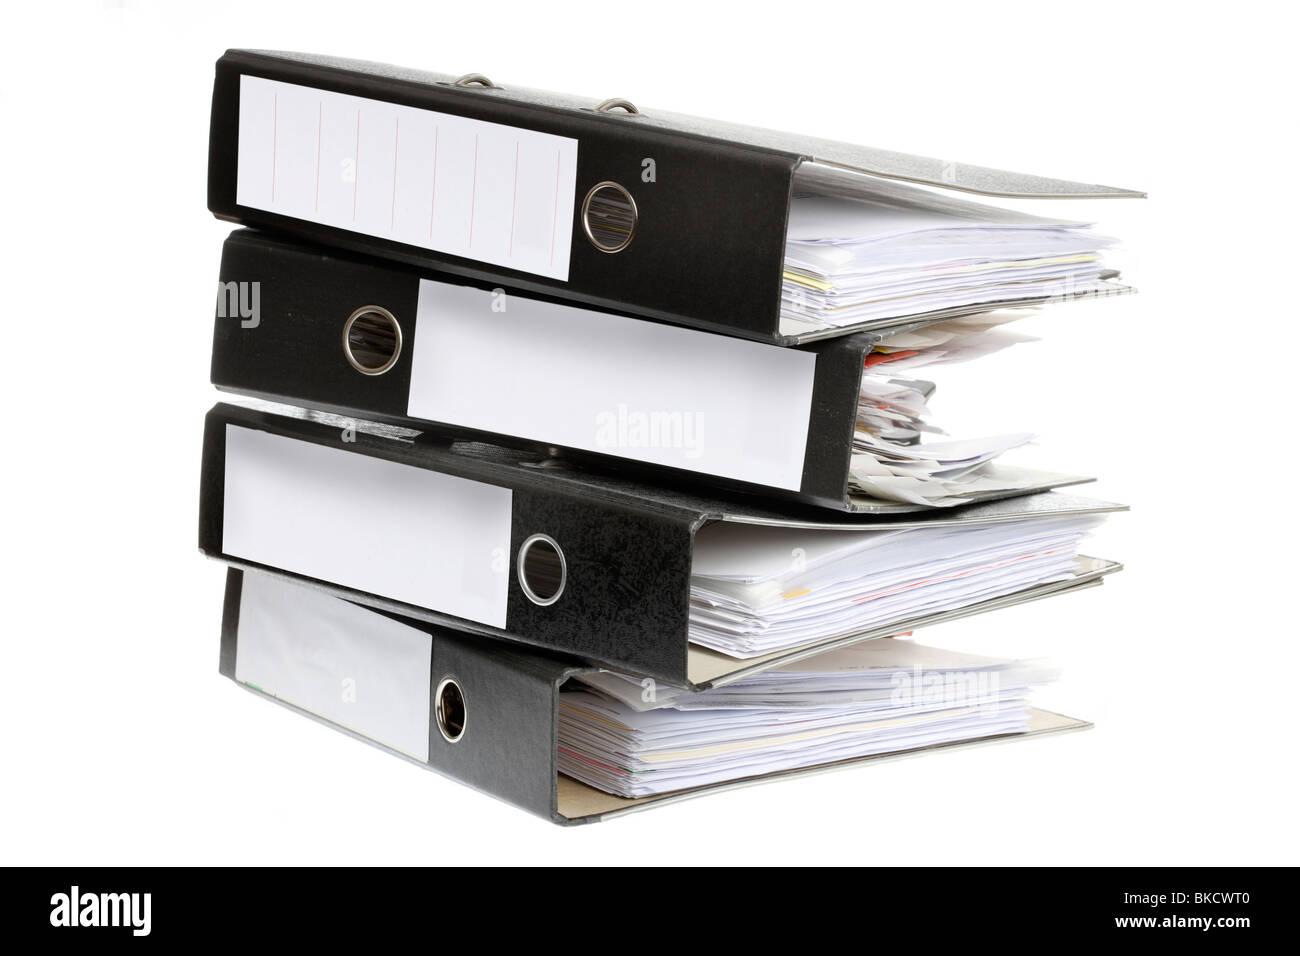 Document file, box file, office supply, paperwork. filing folder. - Stock Image